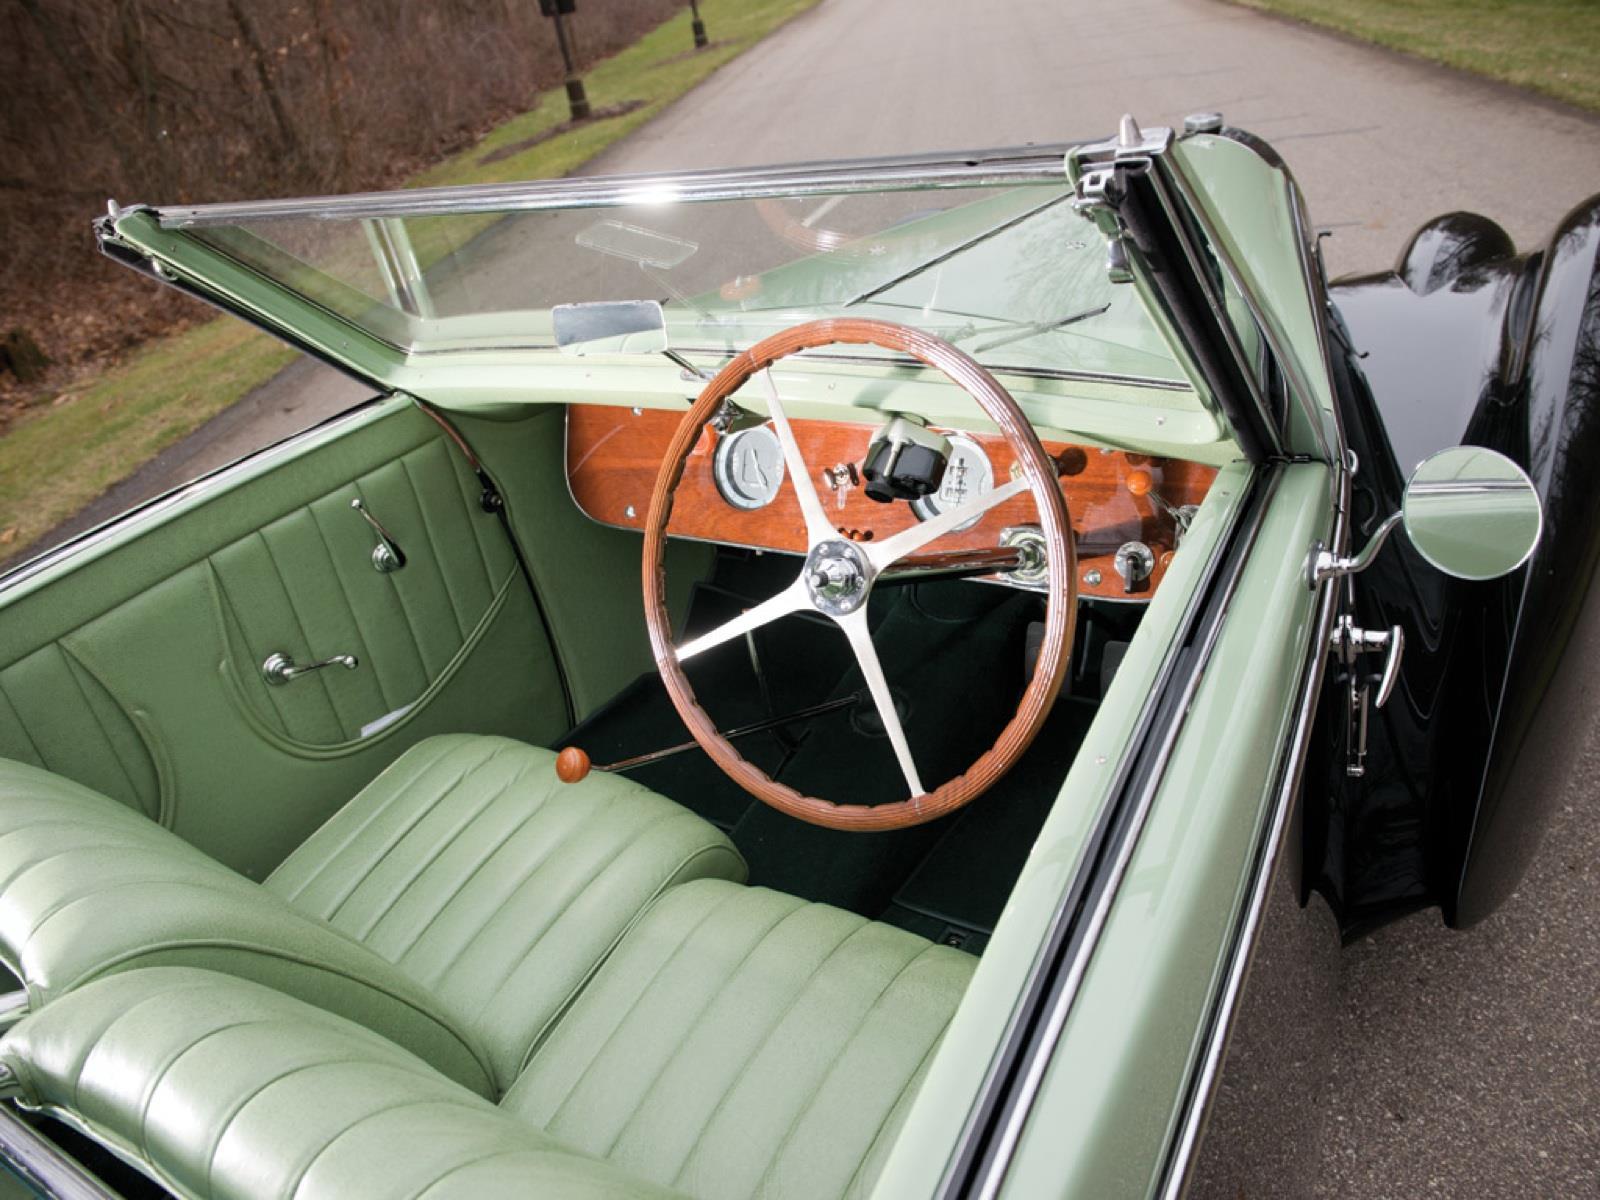 bugatti type 57c aravis cabriolet by gangloff 1938. Black Bedroom Furniture Sets. Home Design Ideas